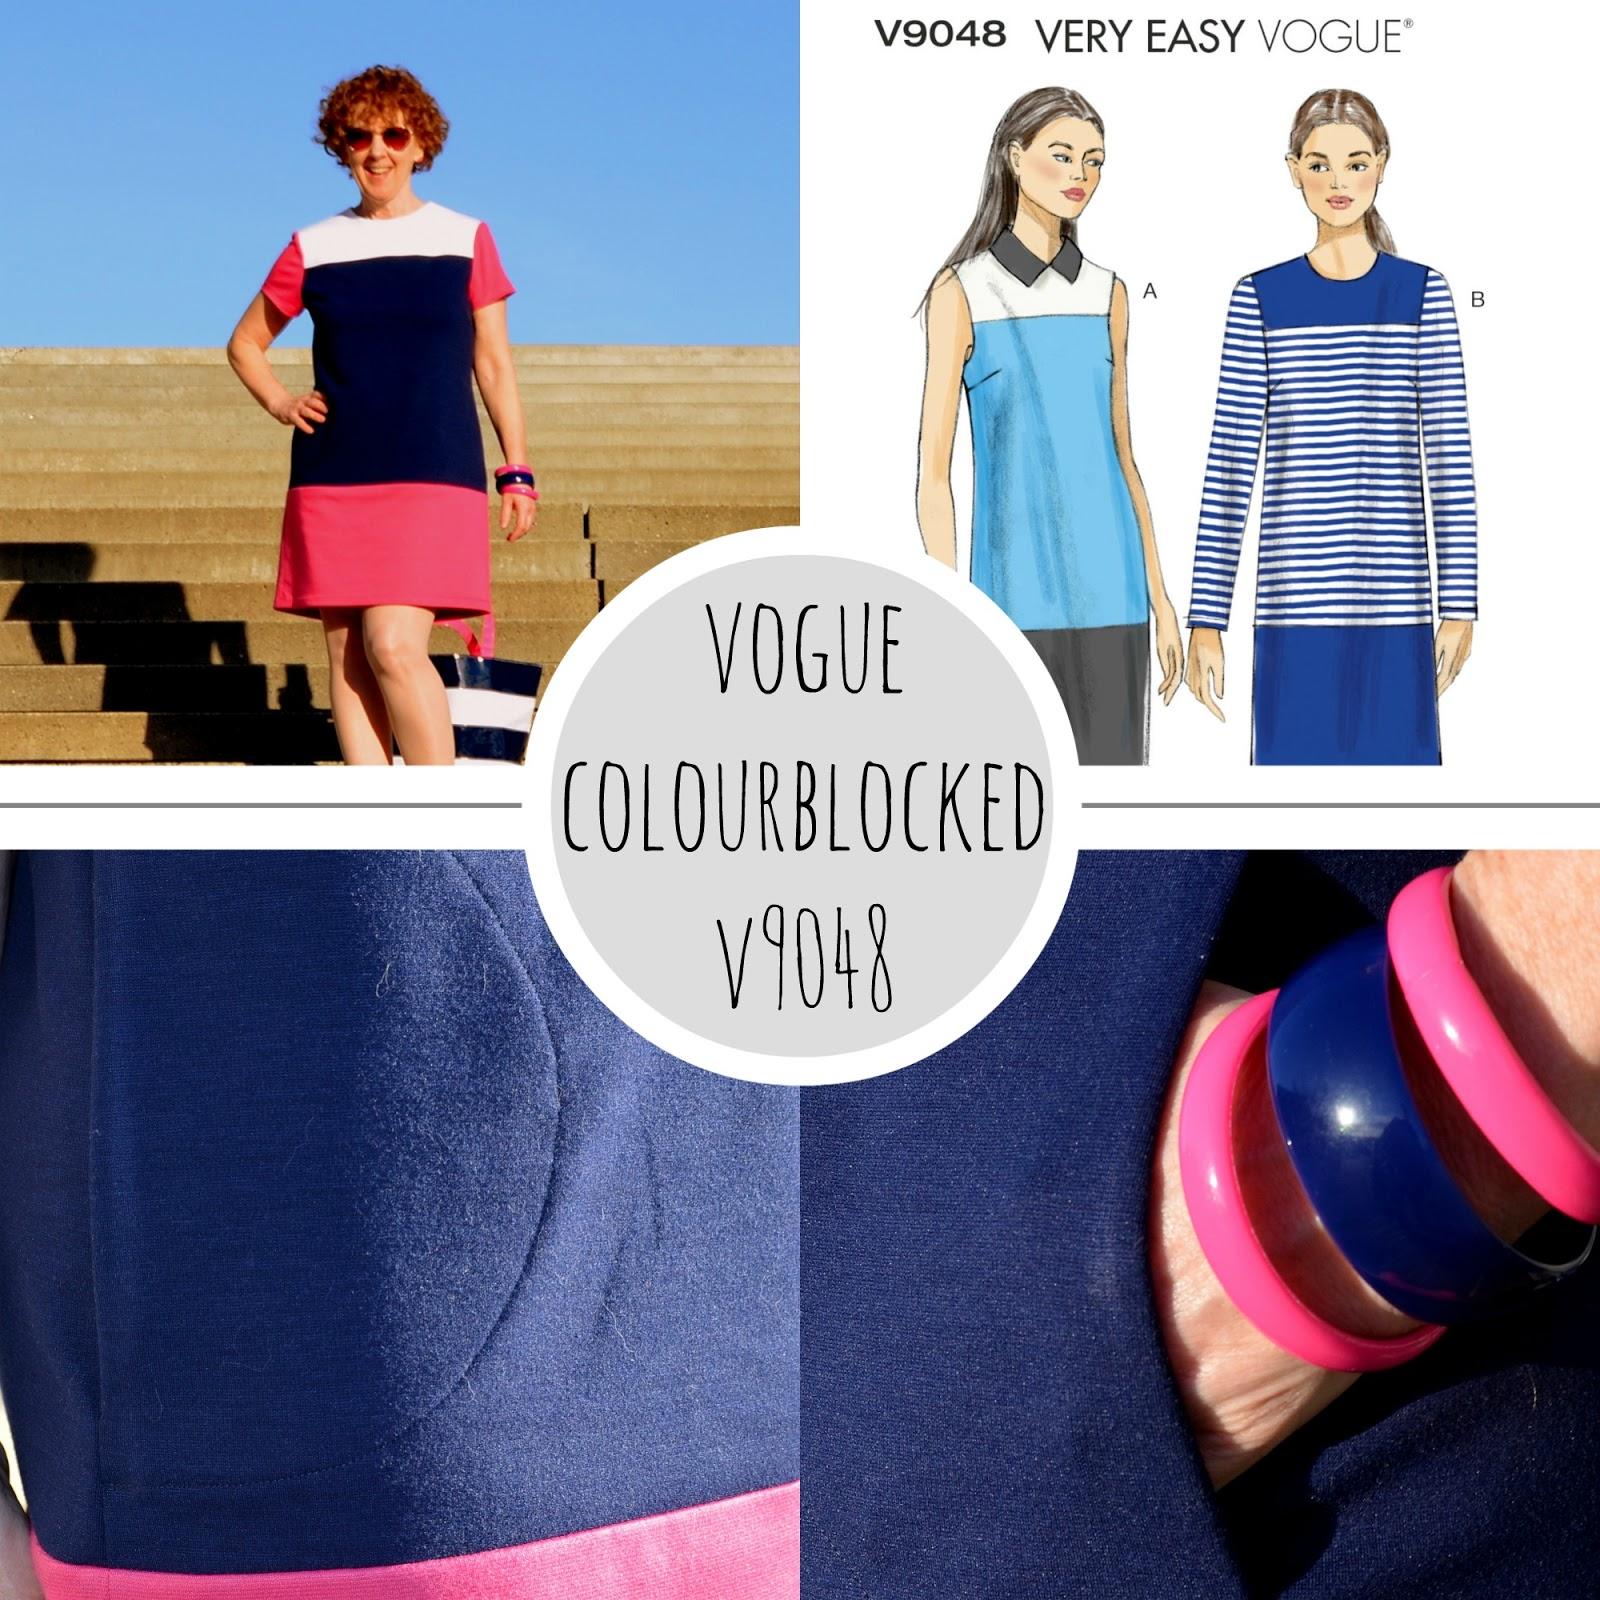 Vogue-Pattern-V9048-Vogue-9048.jpg